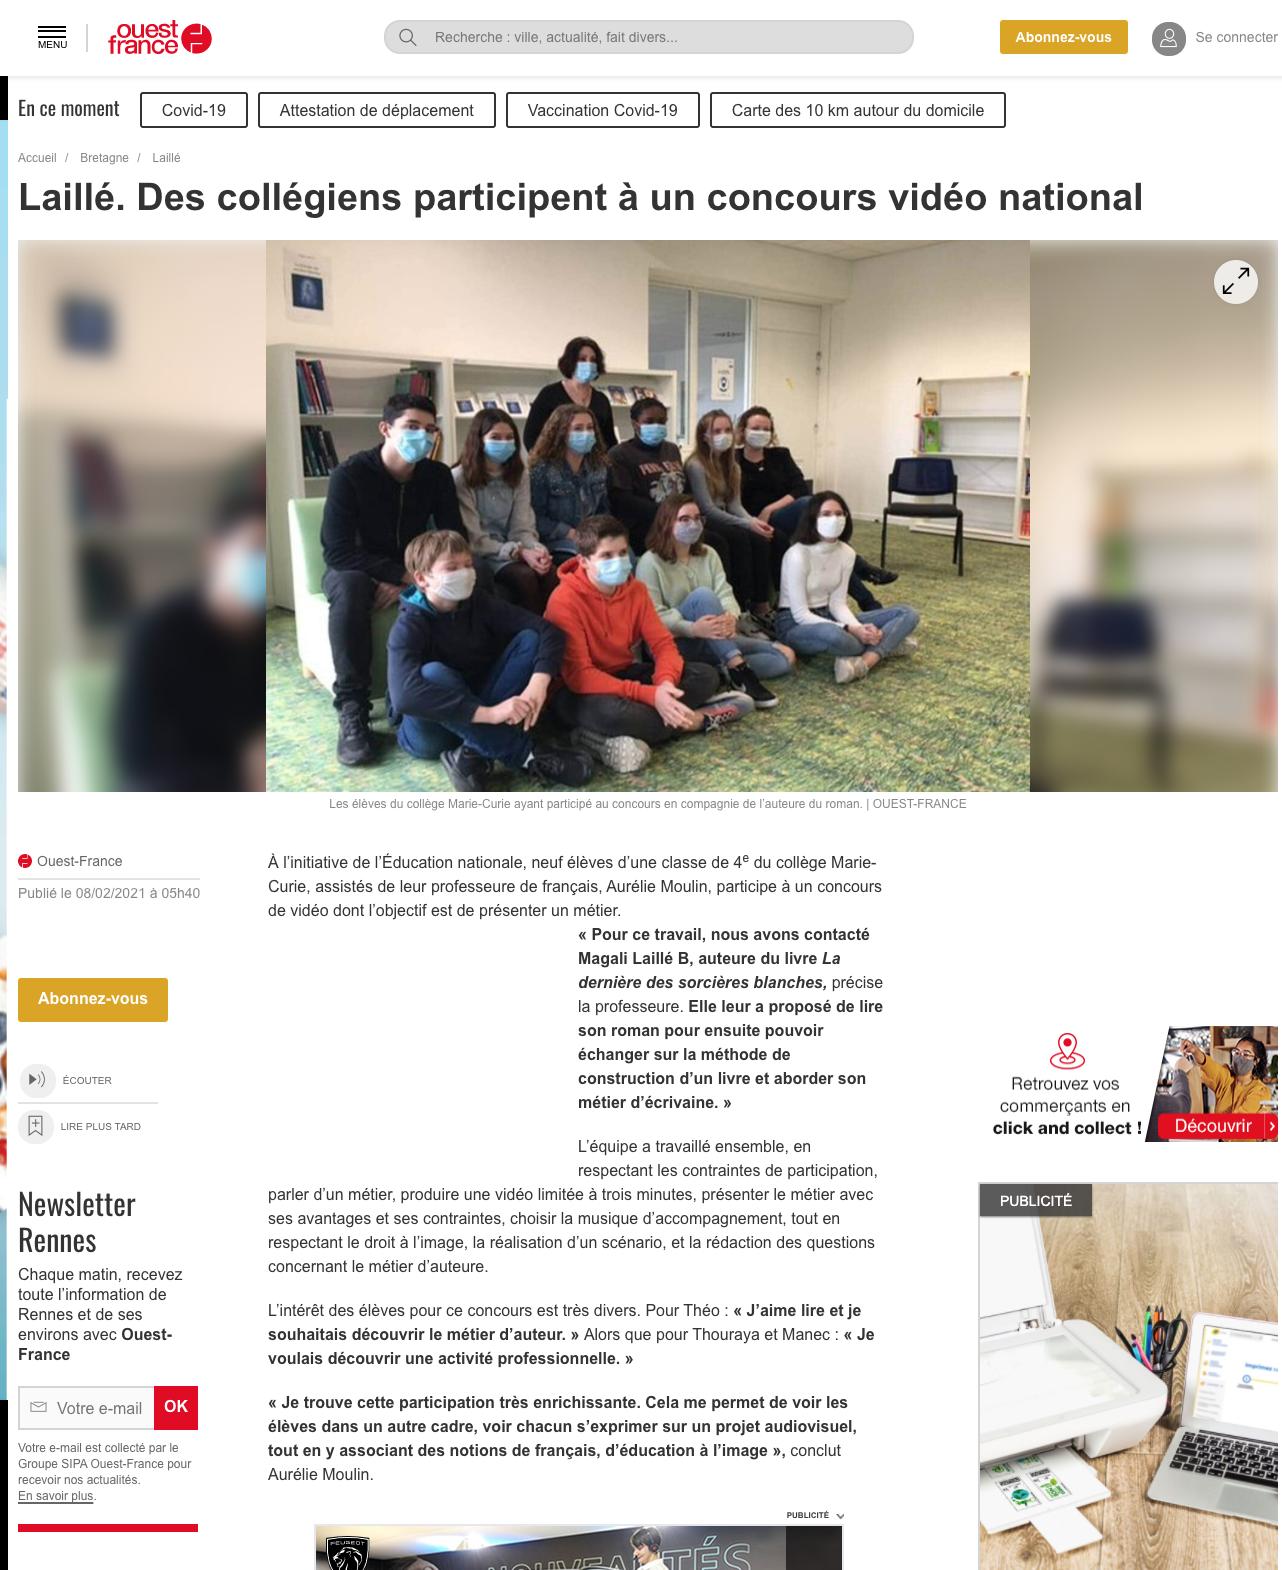 Ouest-France.fr - 08/02/2021